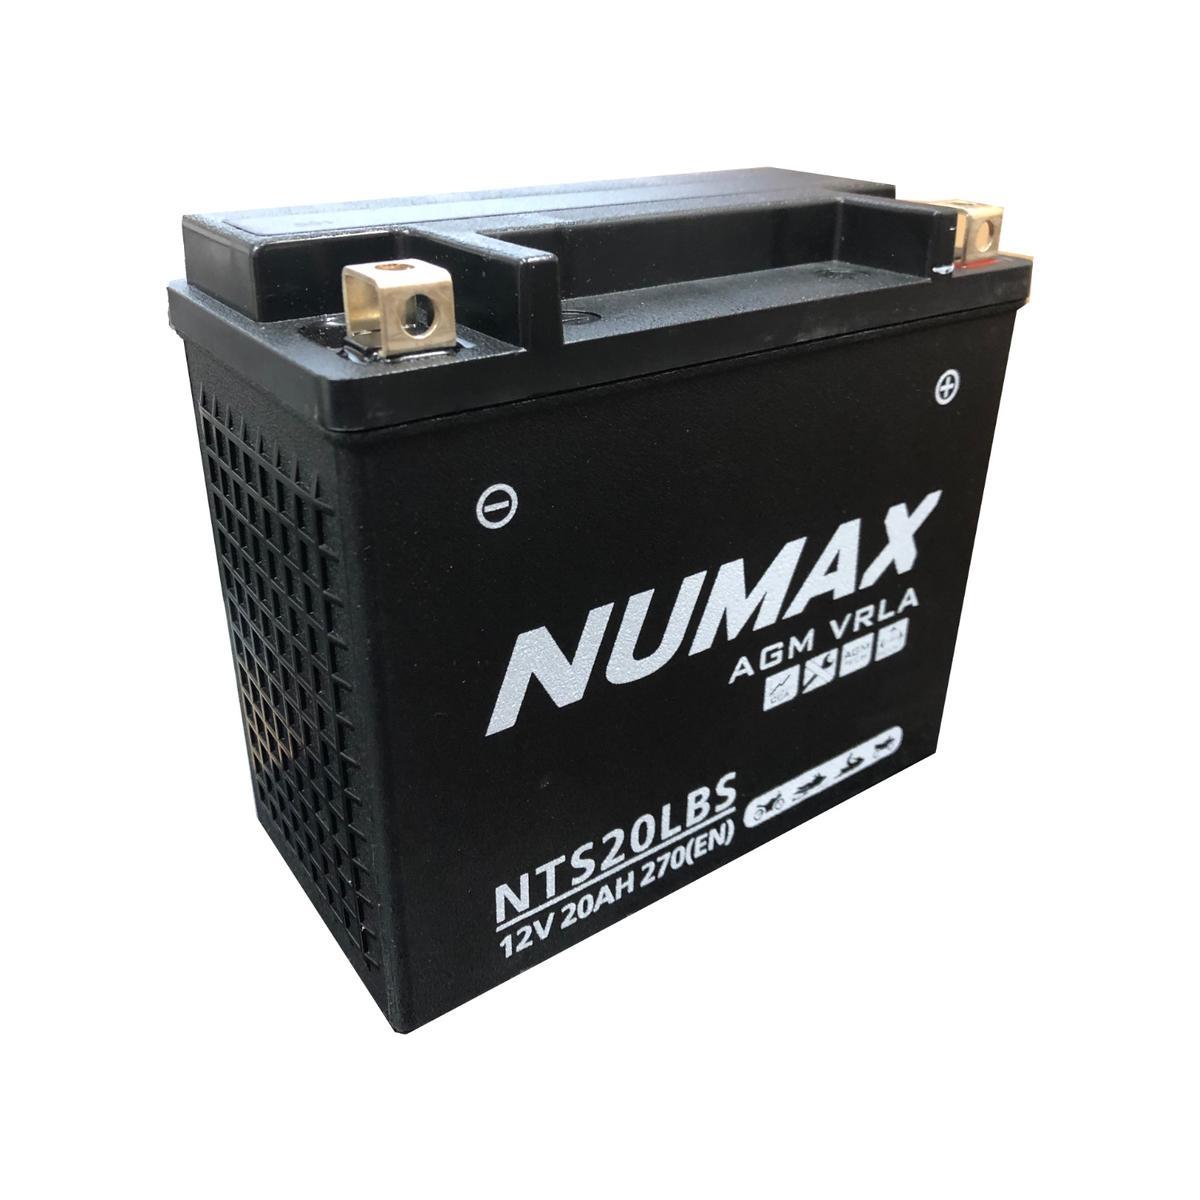 Numax NTS20LBS Motorbike Motorcycle Battery MOTO GUZZI 750cc Nevada YB18L-A